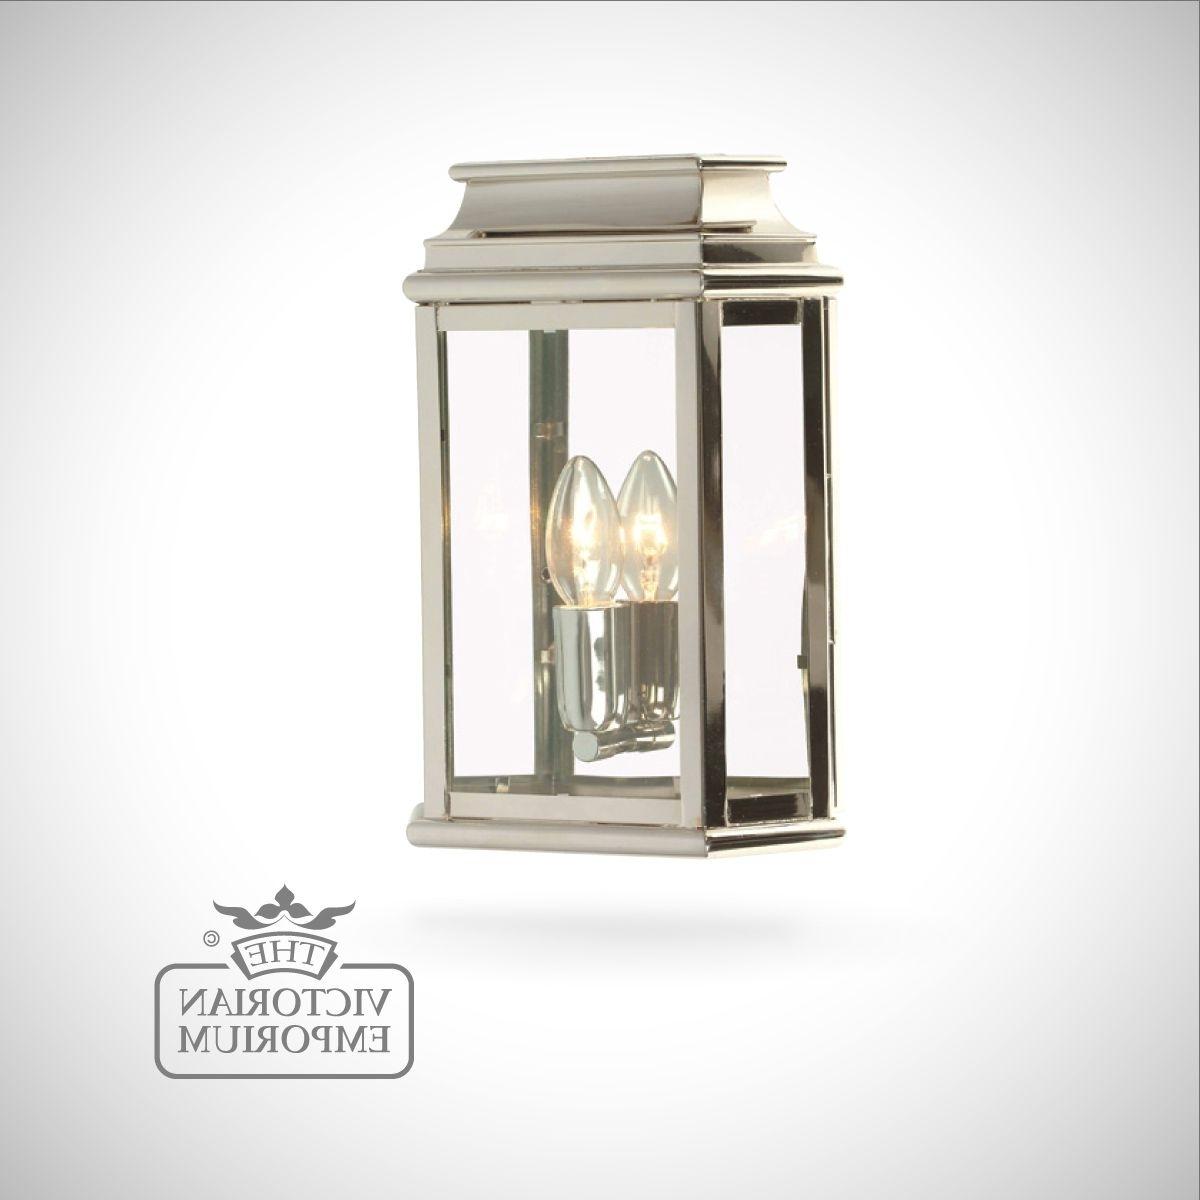 Trendy Nickel Outdoor Wall Lighting Inside Martins Brass Wall Lantern – Polished Nickel (View 17 of 20)